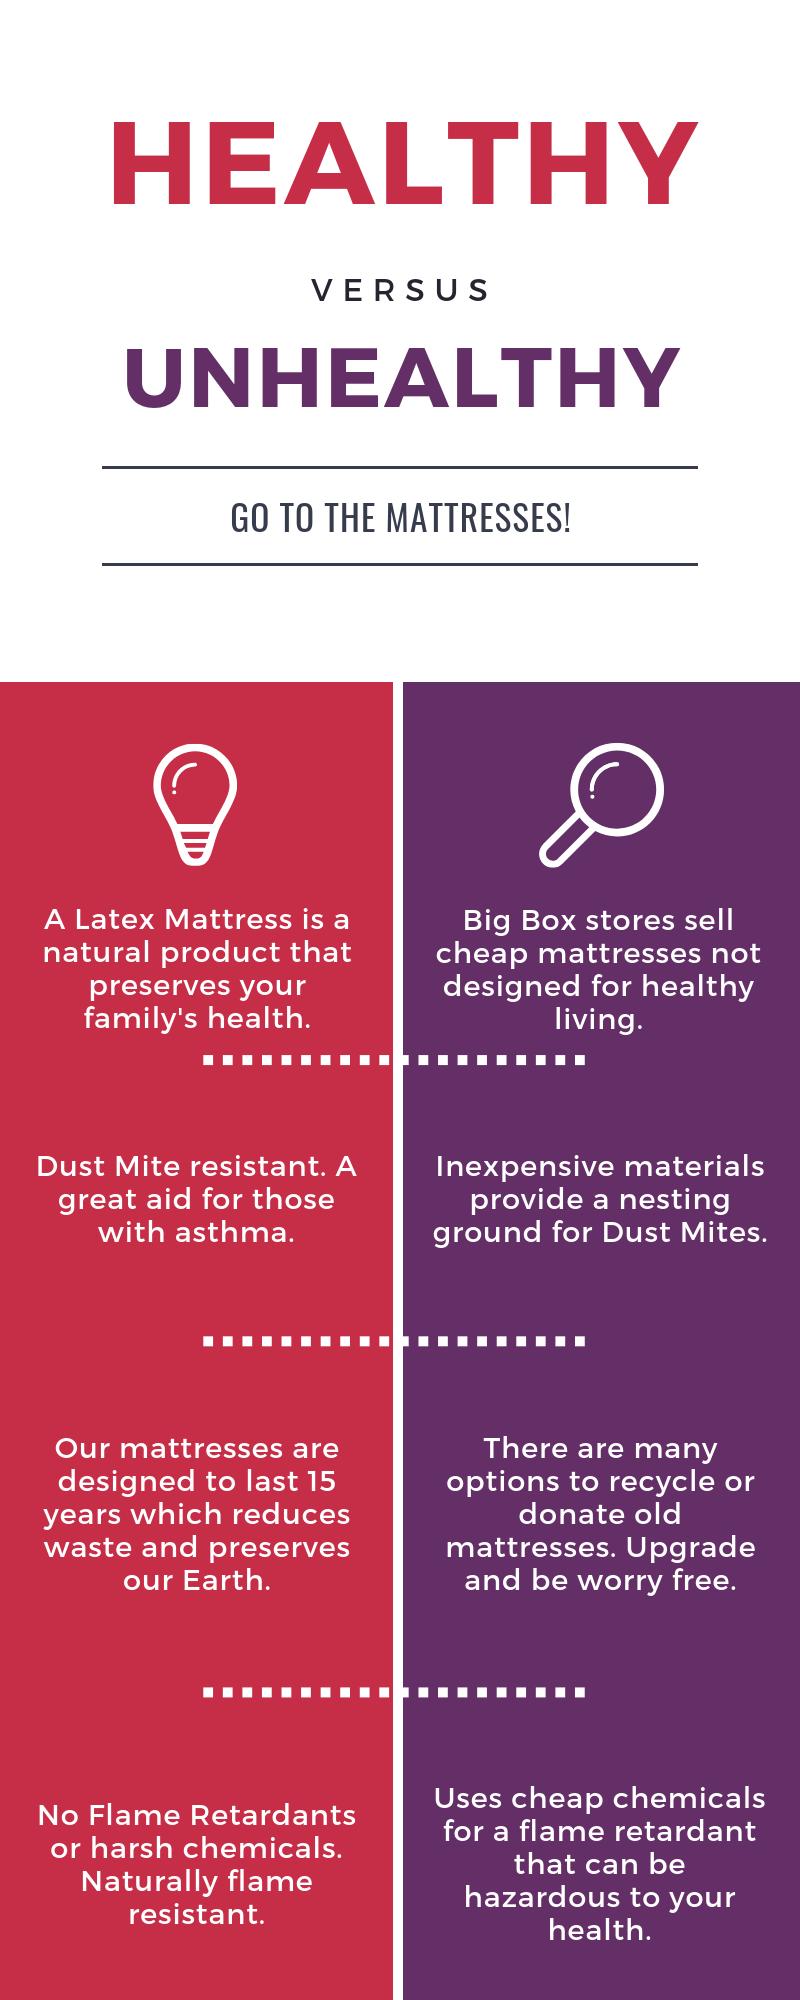 healthy-versus-unhealthy-mattresses.png